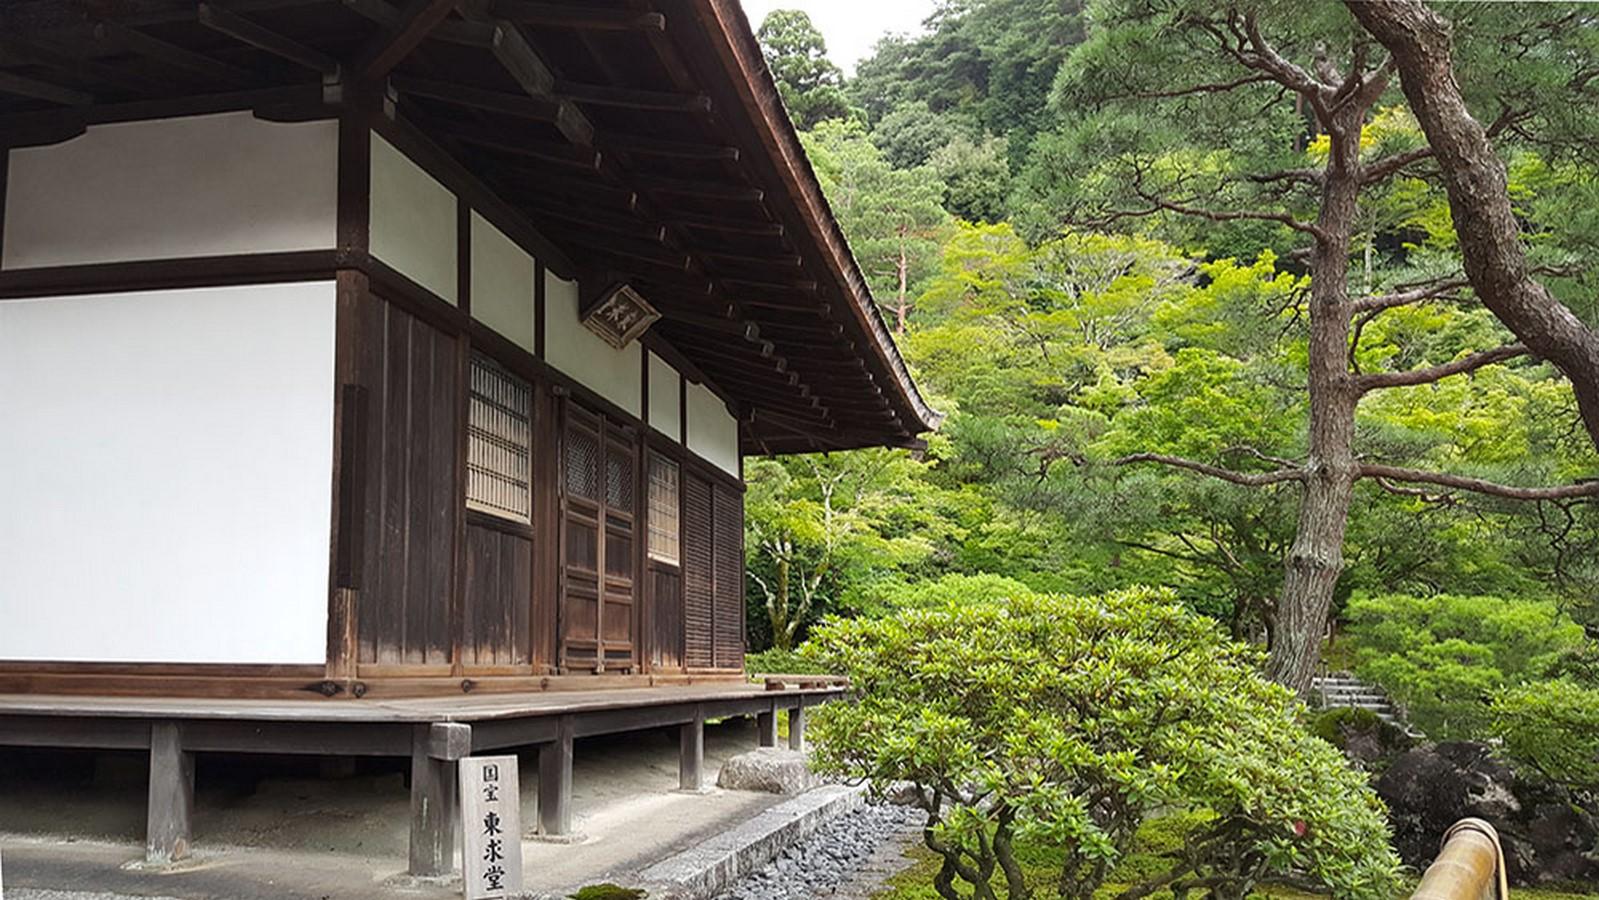 Shoin-zukuri Architecture: Japanese residential architecture - Sheet12